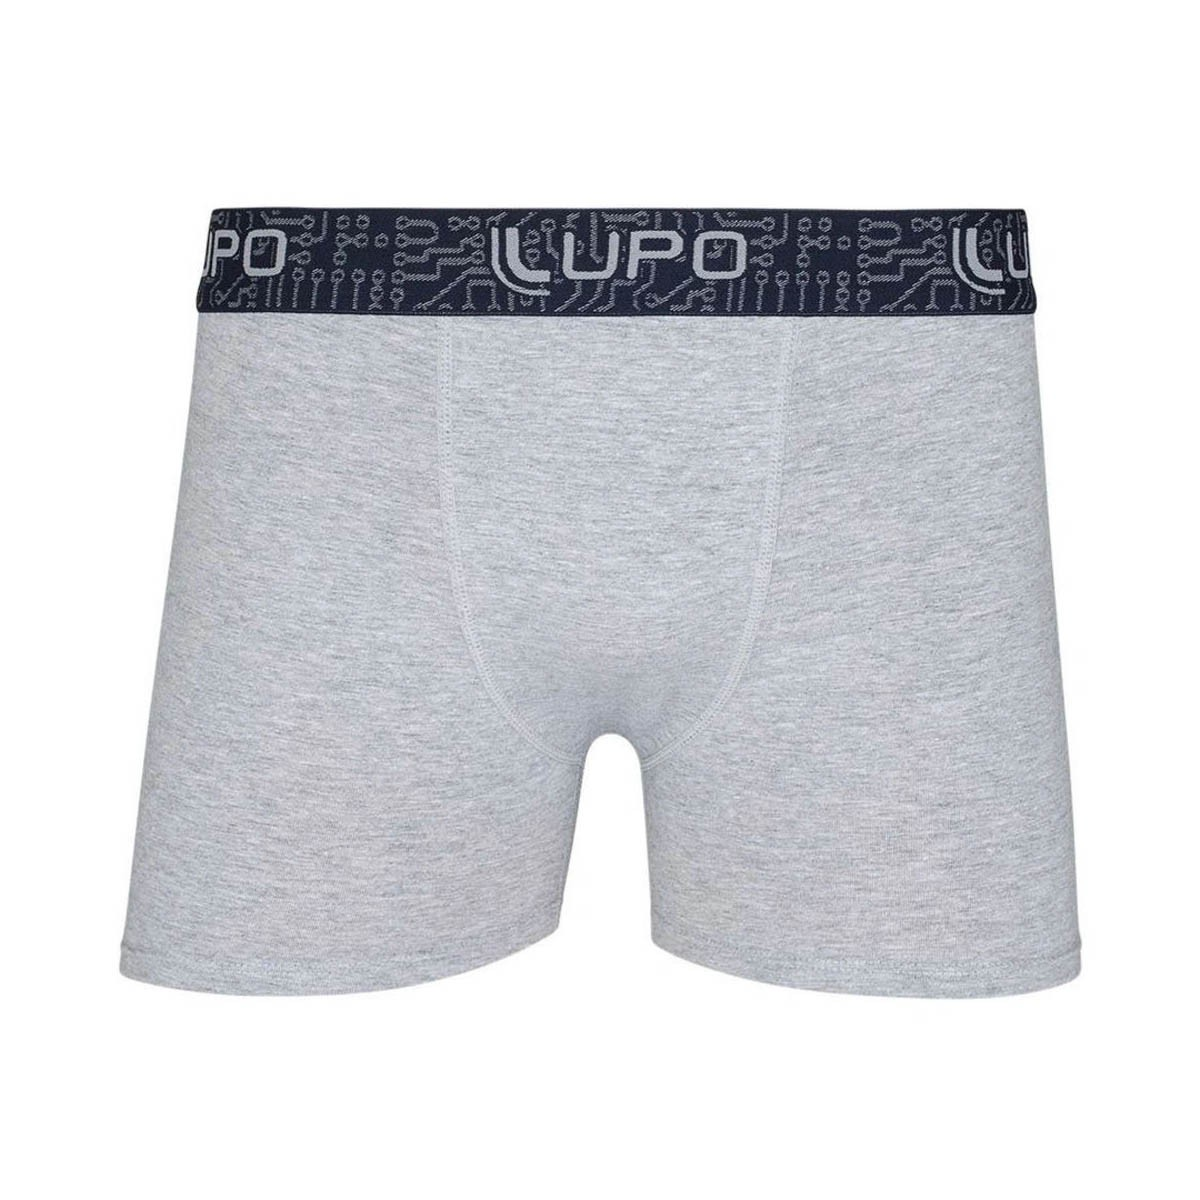 Cueca algodão boxer masculina adulto Lupo